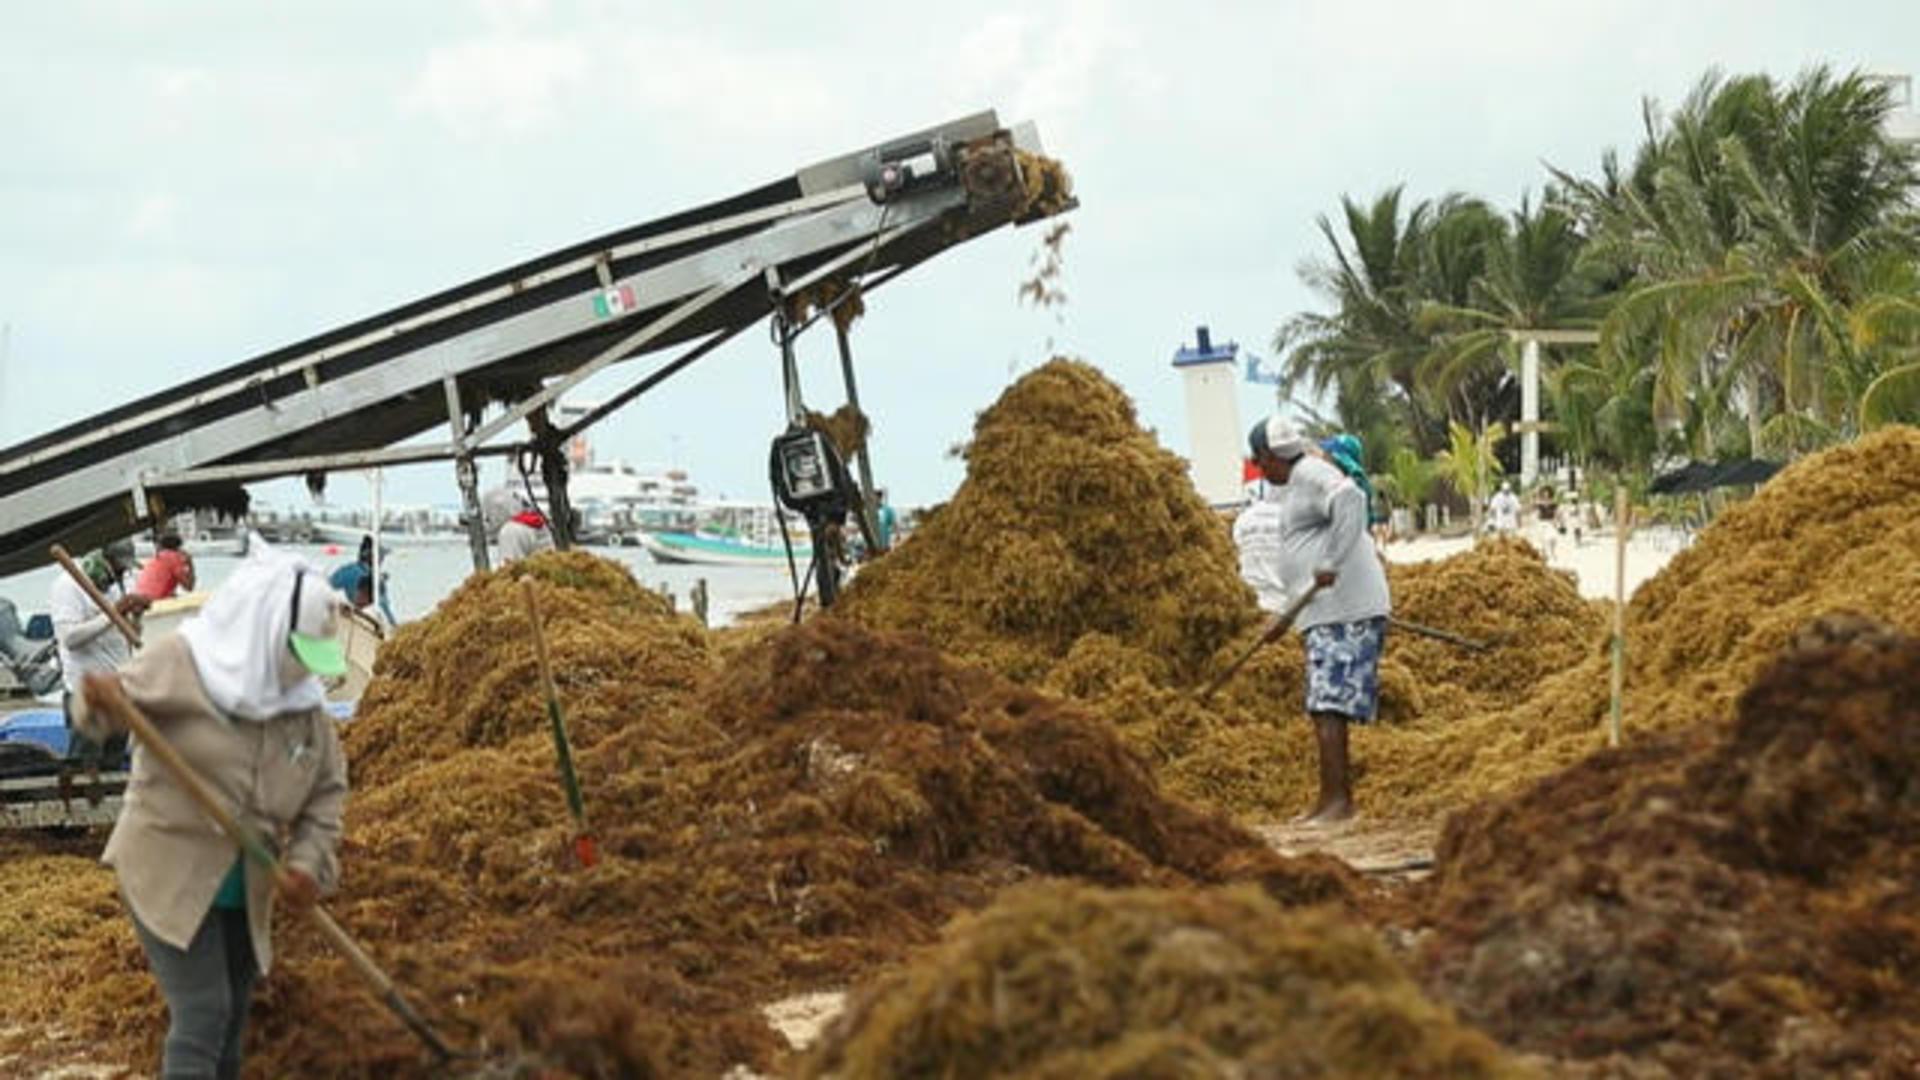 Massive waves of toxic seaweed inundate Yucatan Peninsula beaches